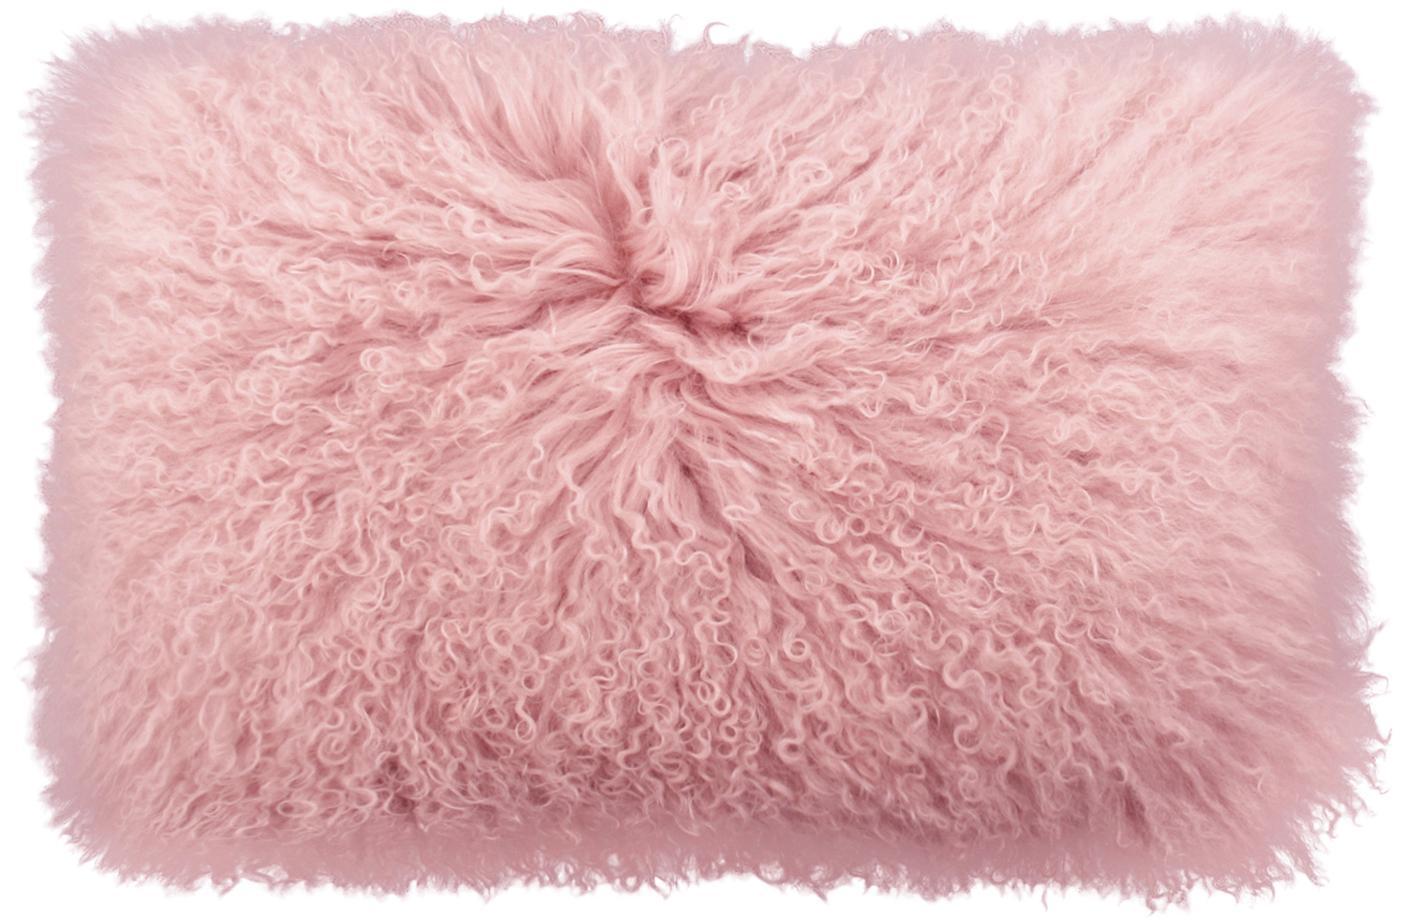 Langhaar-Lammfell Kissenhülle Ella, gelockt, Vorderseite: 100% mongolisches Lammfel, Rückseite: 100% Polyester, Rosa, 30 x 50 cm